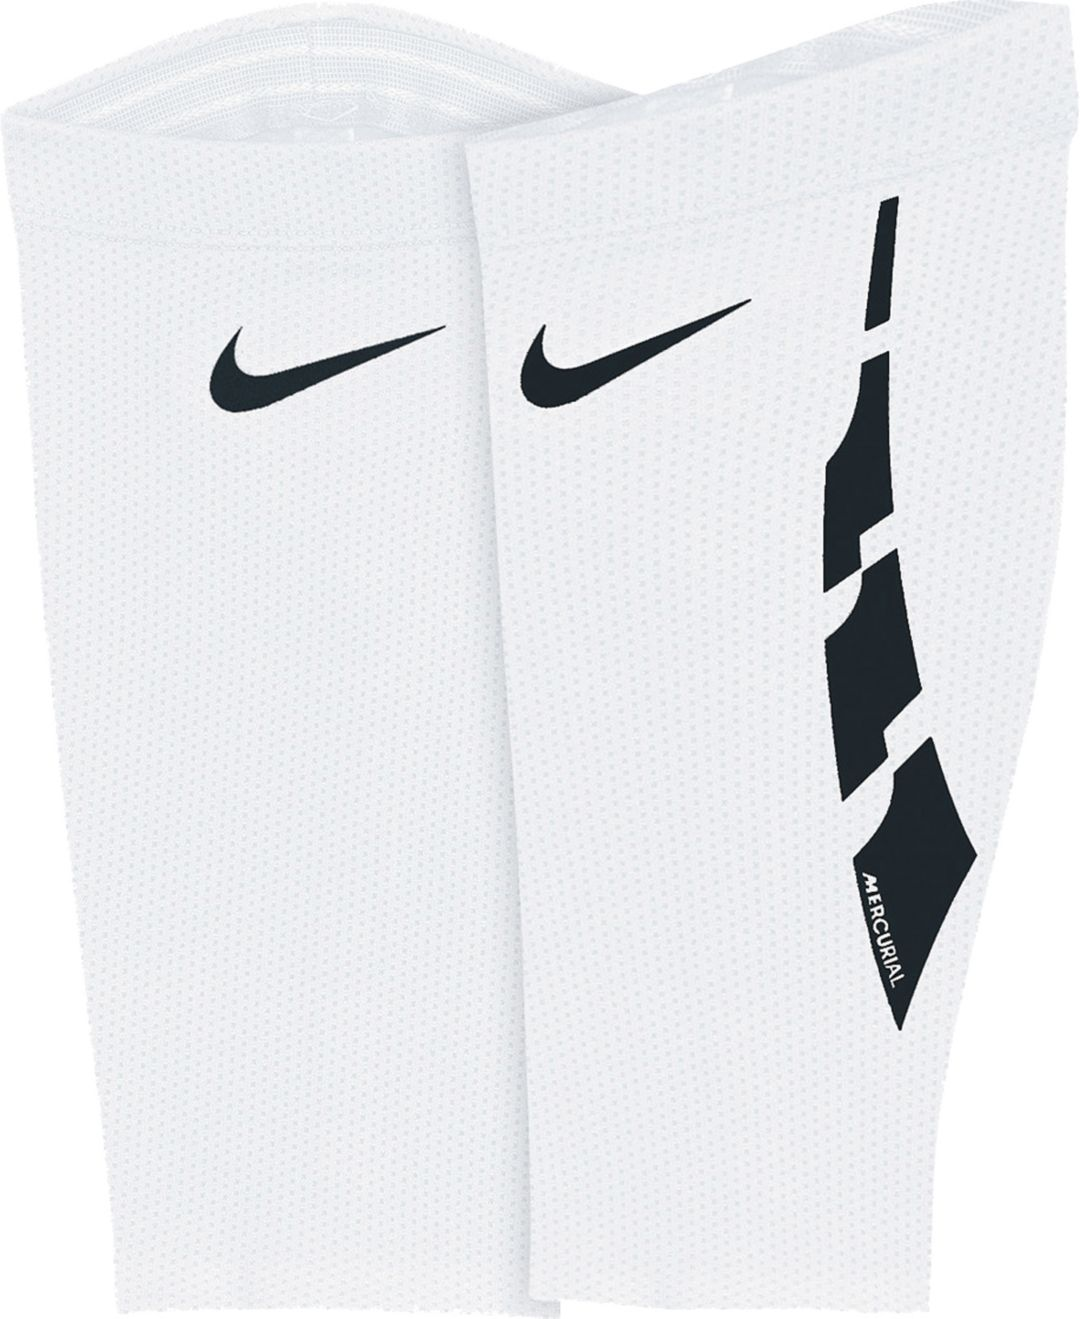 629ecd827 Nike Guard Lock Soccer Shin Guard Sleeves | DICK'S Sporting Goods